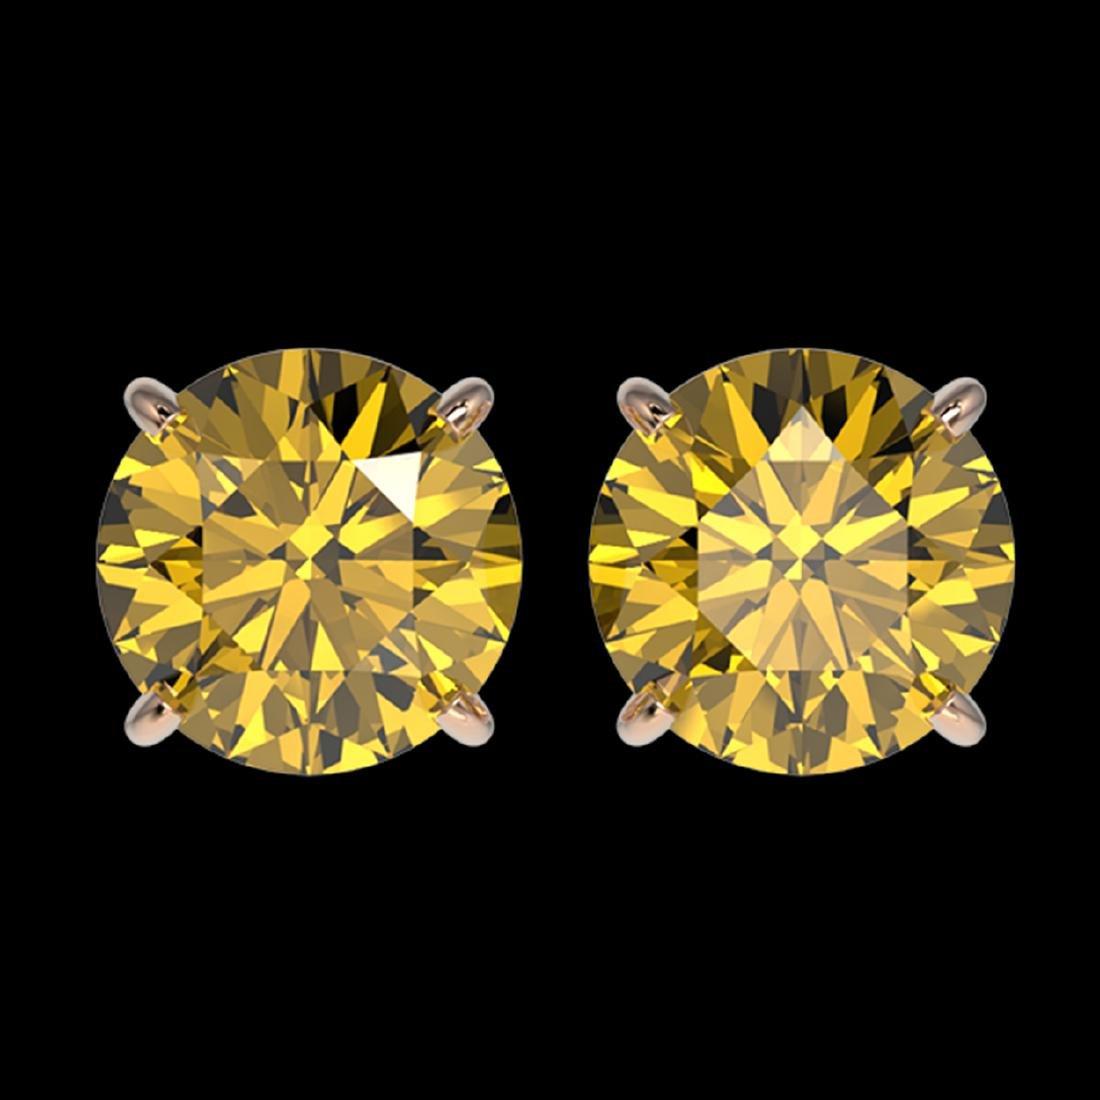 2.57 ctw Intense Yellow Diamond Stud Earrings 10K Rose